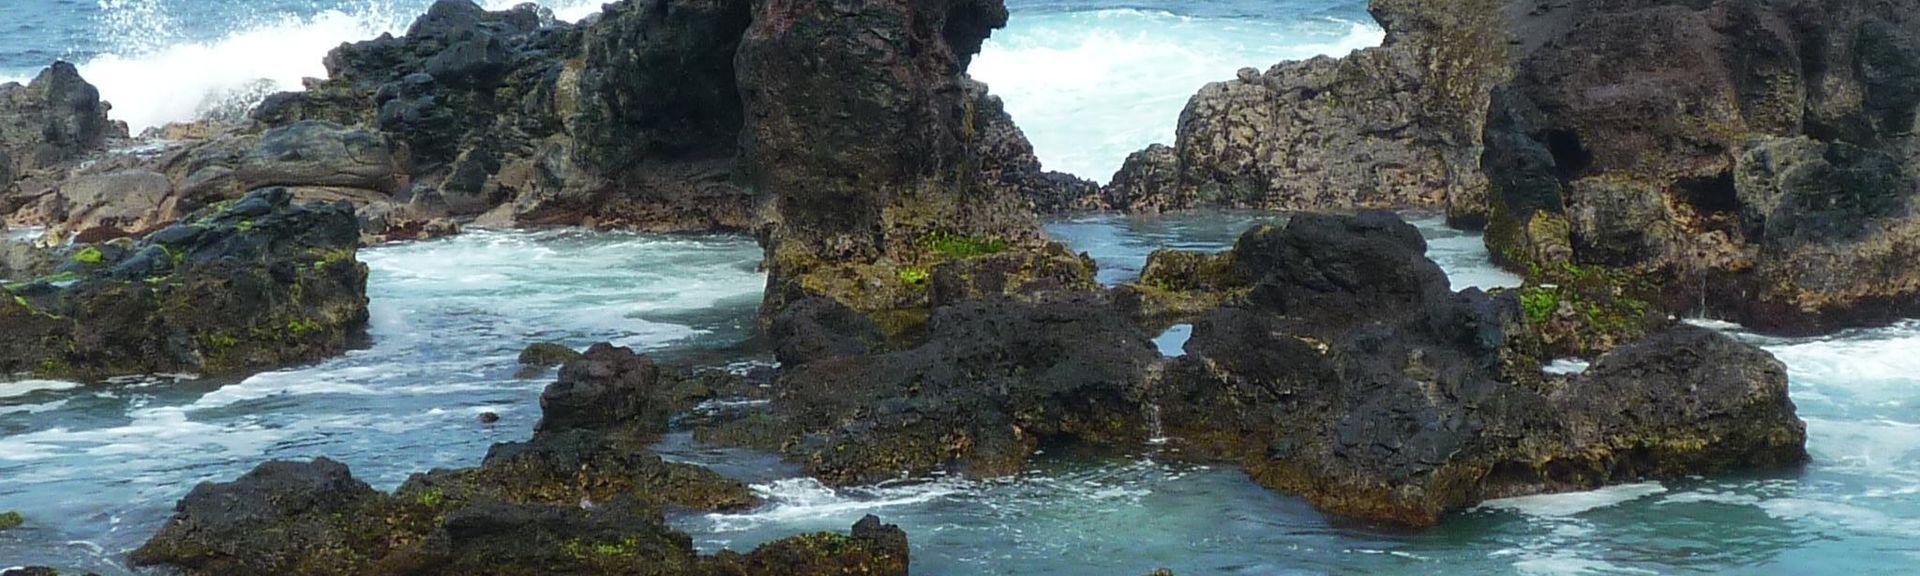 Maui Parkshore (Kihei, Hawaje, Stany Zjednoczone)